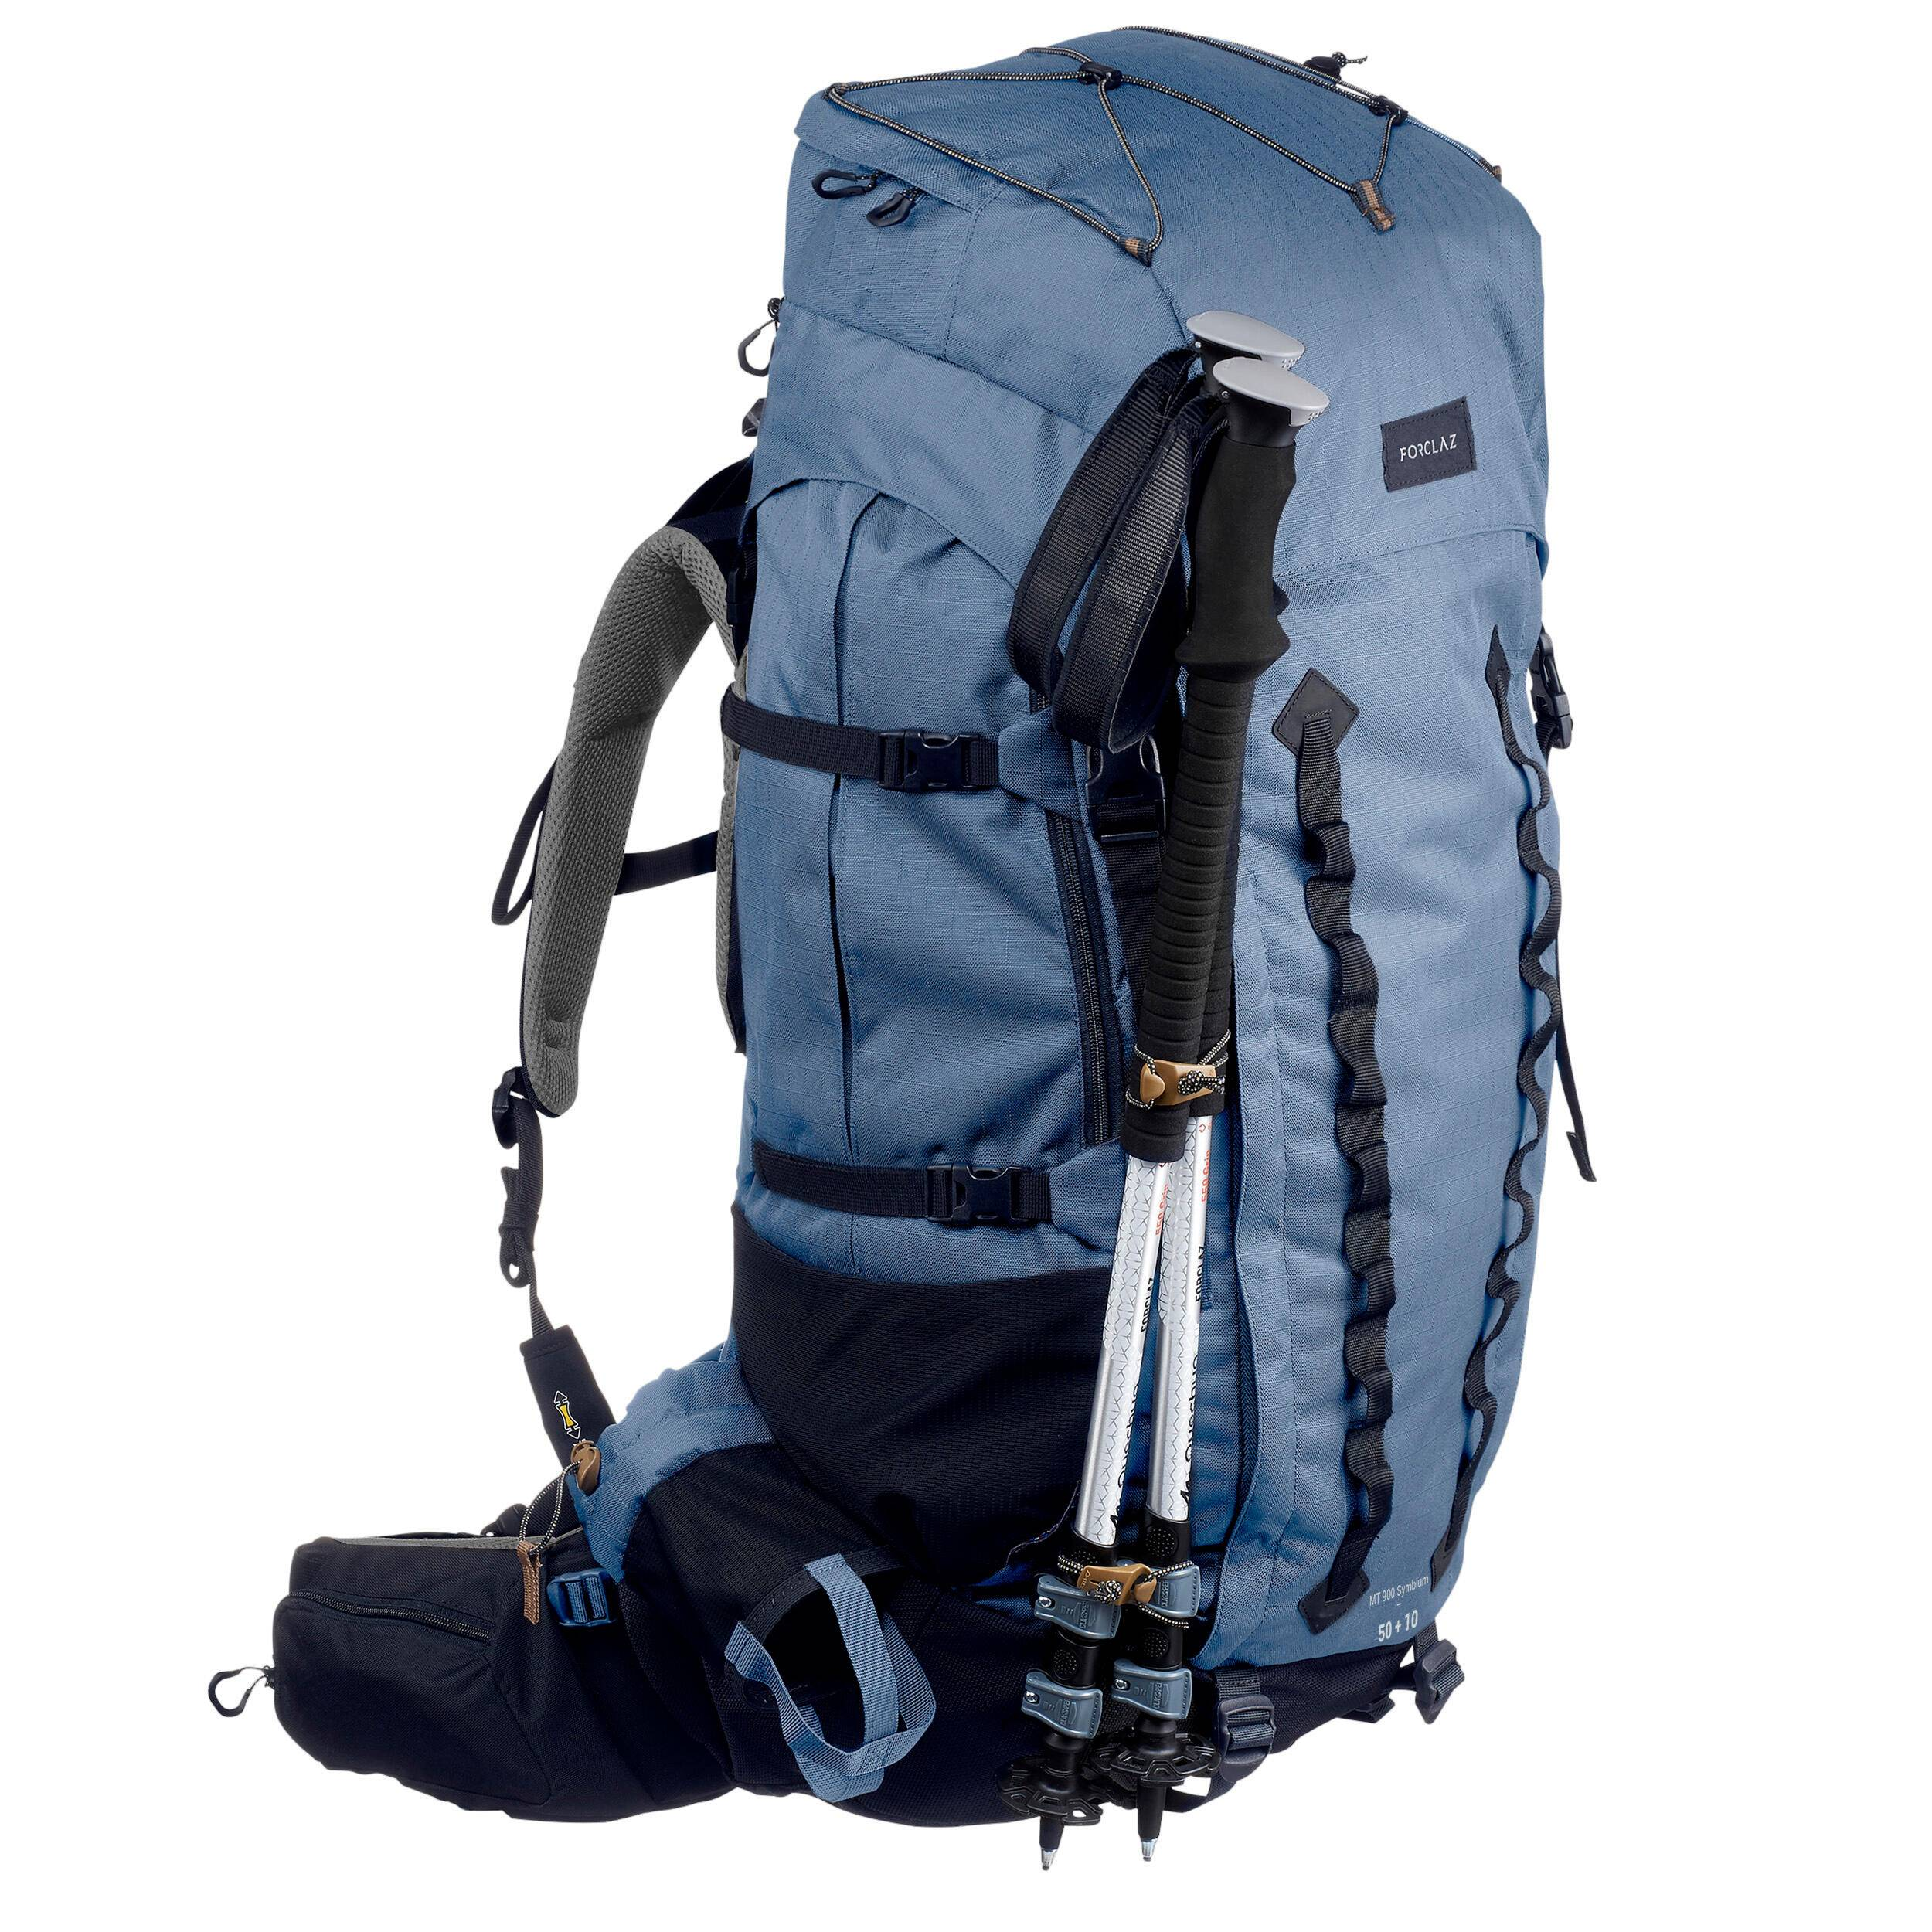 forclaz zaino trekking donna trek 900 symbium 50+10l grigio azzurro